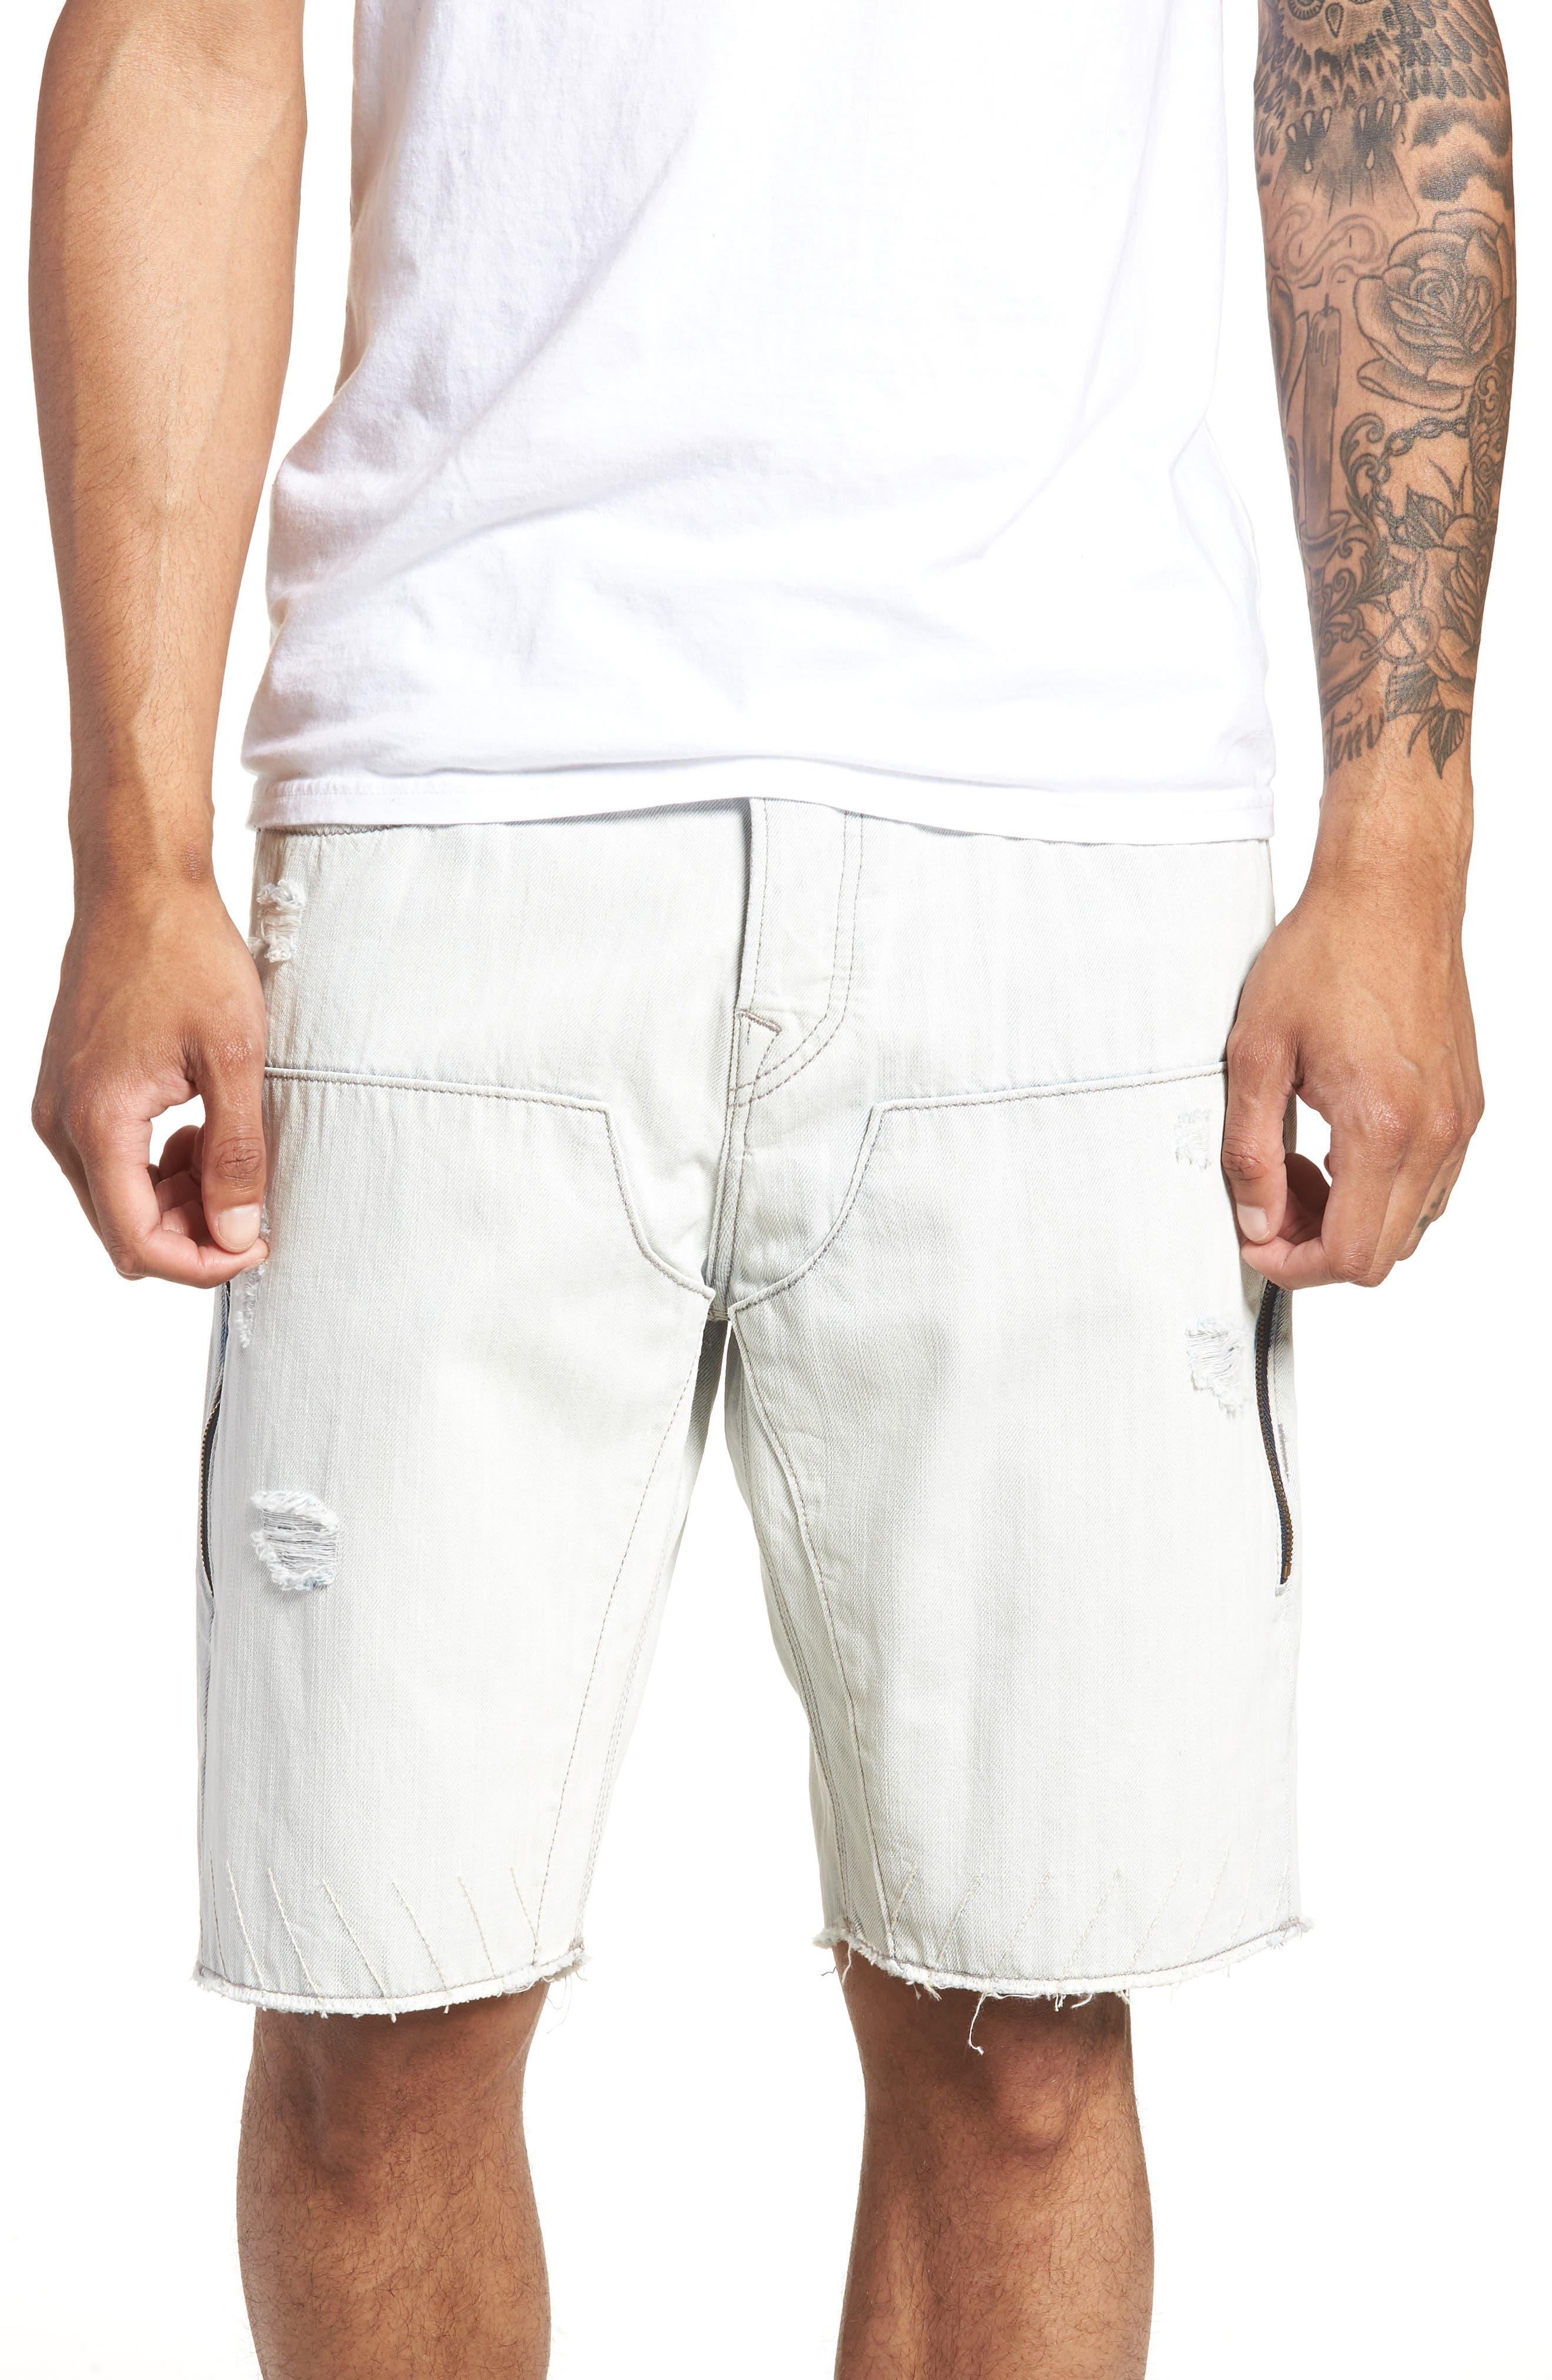 TRUE RELIGION BRAND JEANS Field Shorts, Main, color, 403